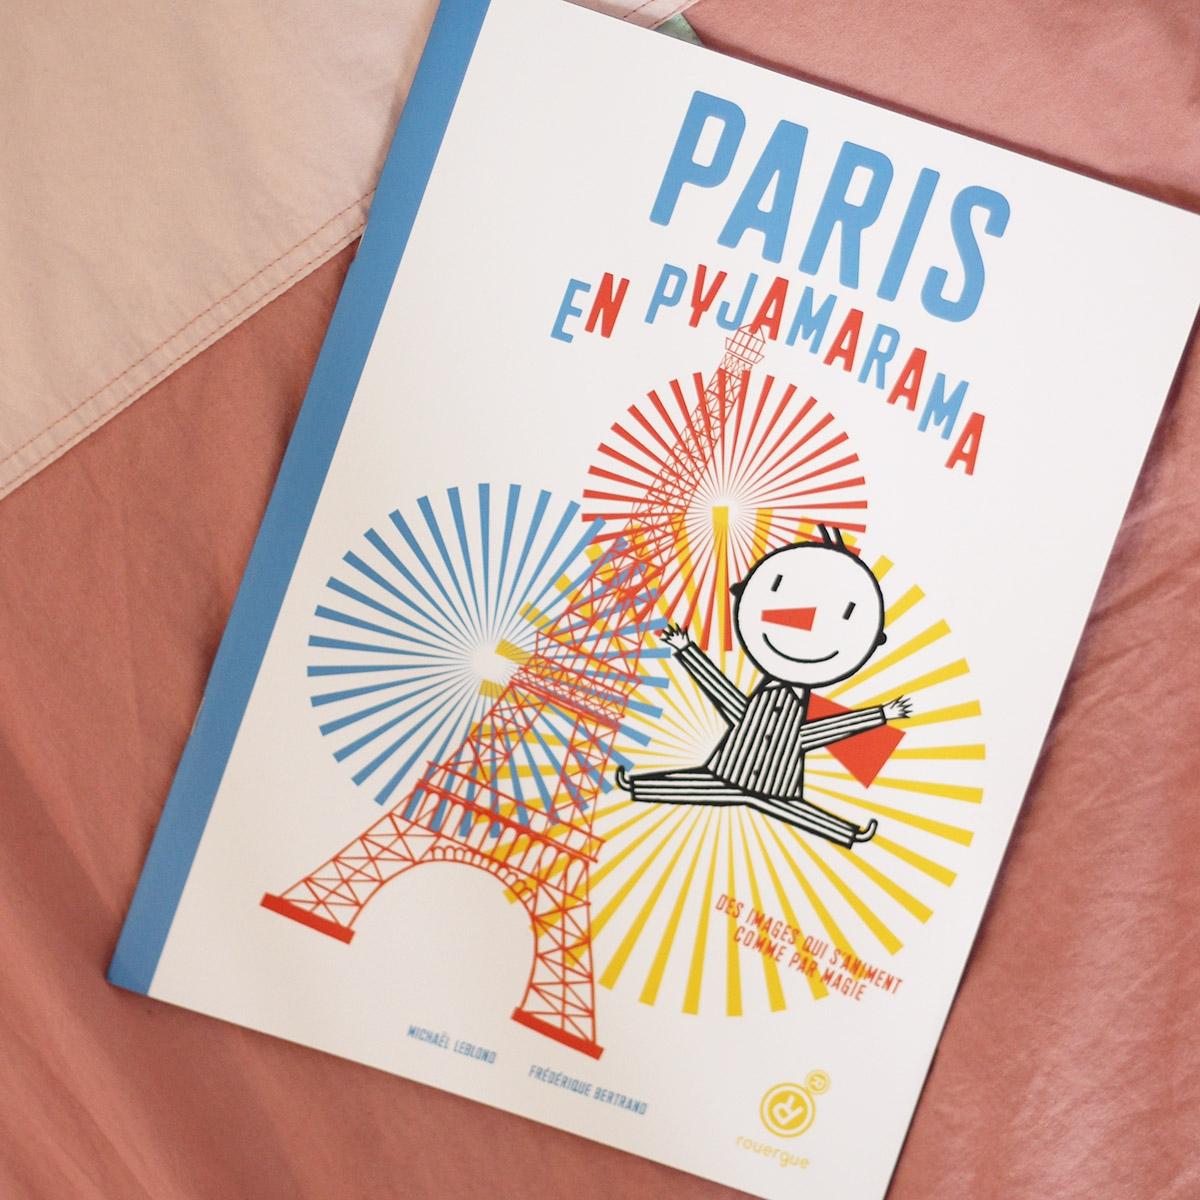 Paris en pyjarama